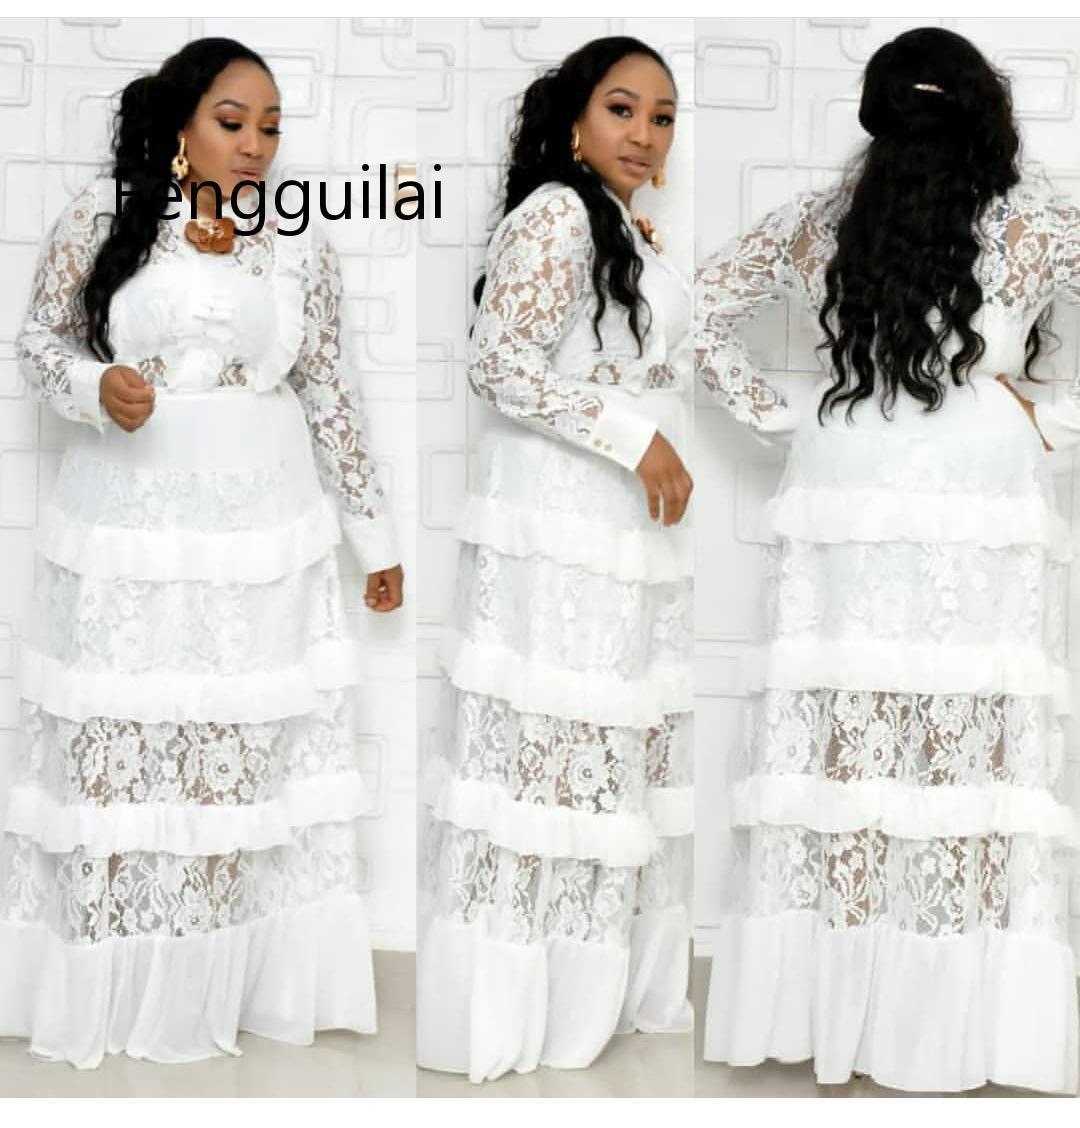 FENGGUILAI 2020 Big Size New Style Classic African Women's Dashiki Fashion Lace Fungus Edge Stitching Long Dress Cupcake Dress